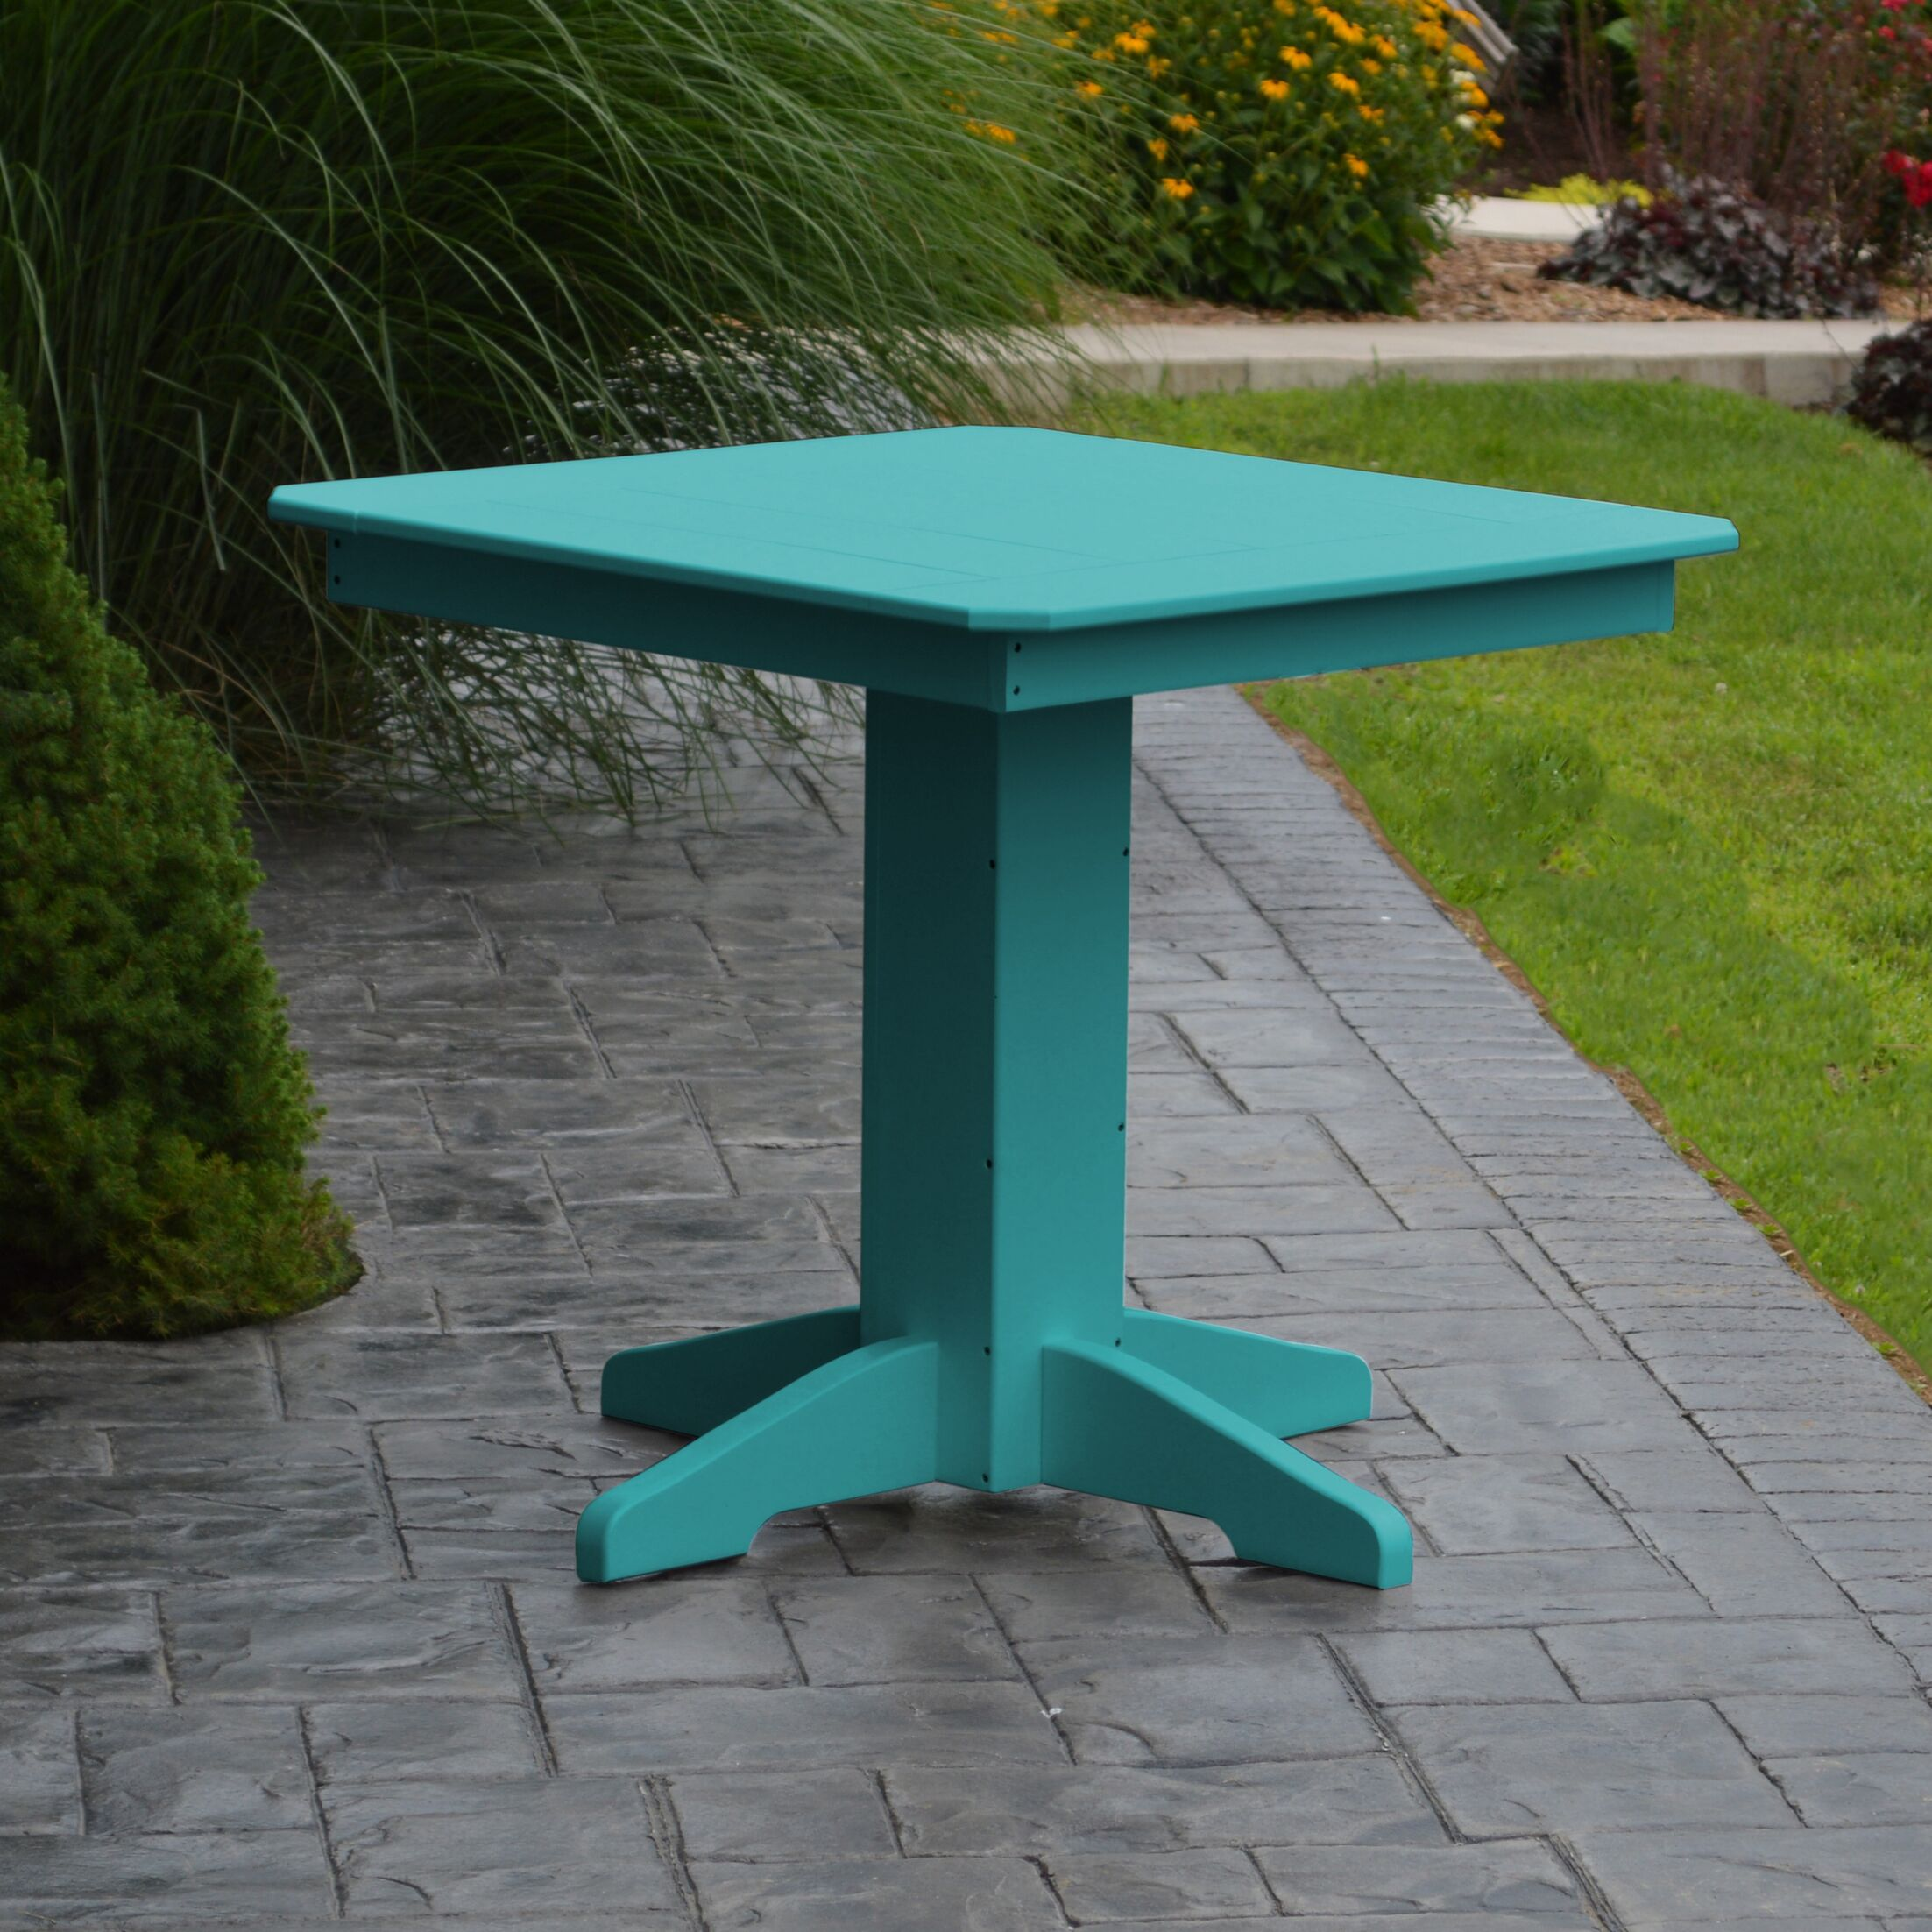 Nettie Dining Table Color: Aruba Blue, Table Size: 33